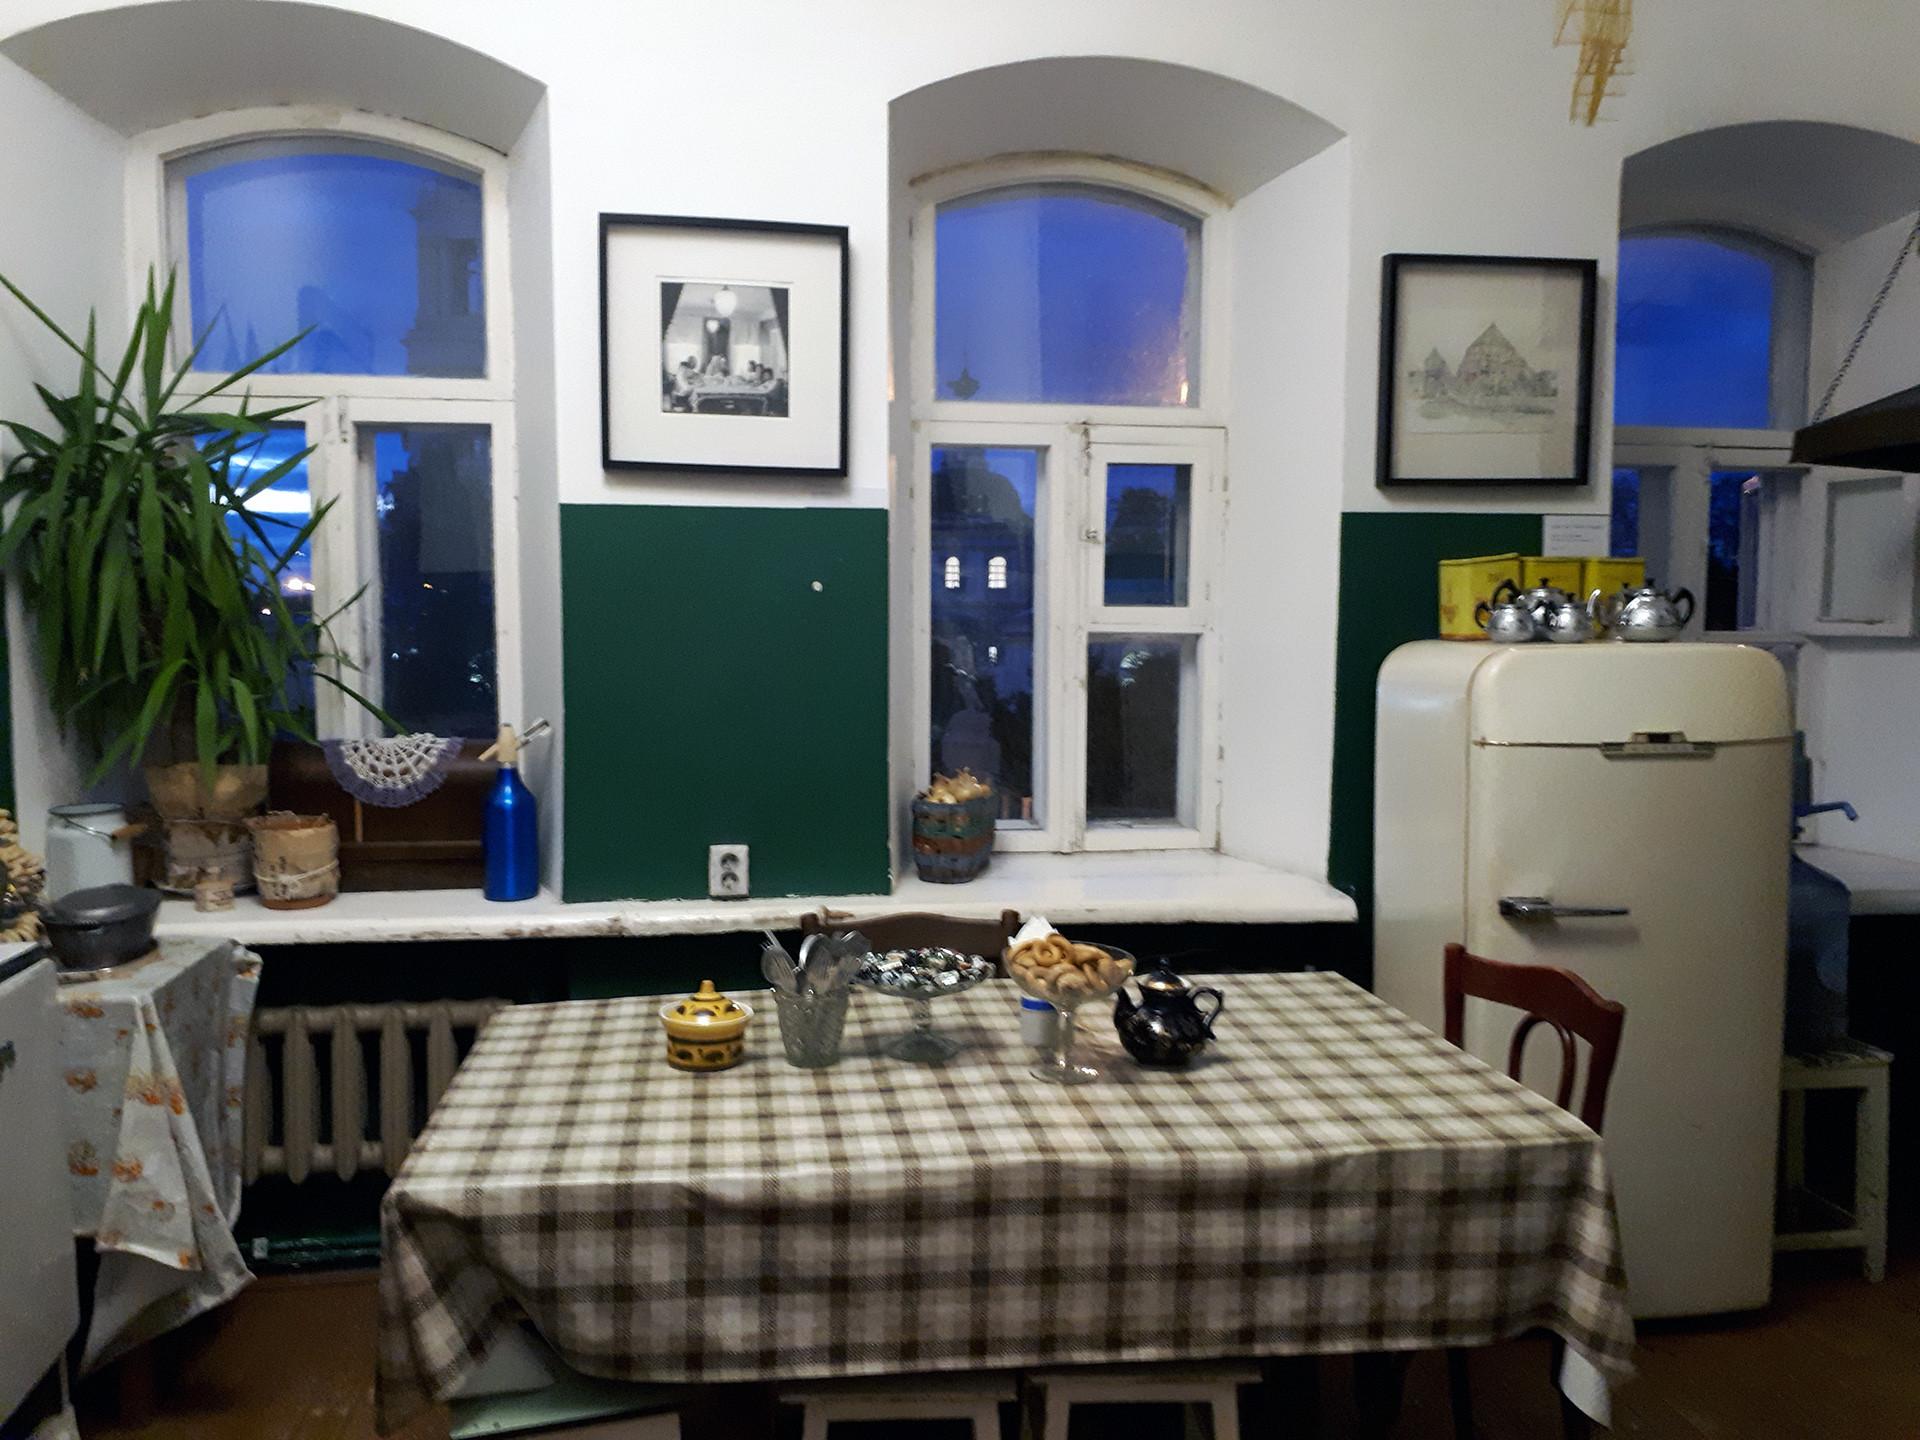 Muzejska rezidenca Artkomunalka, notranjost stanovanja.